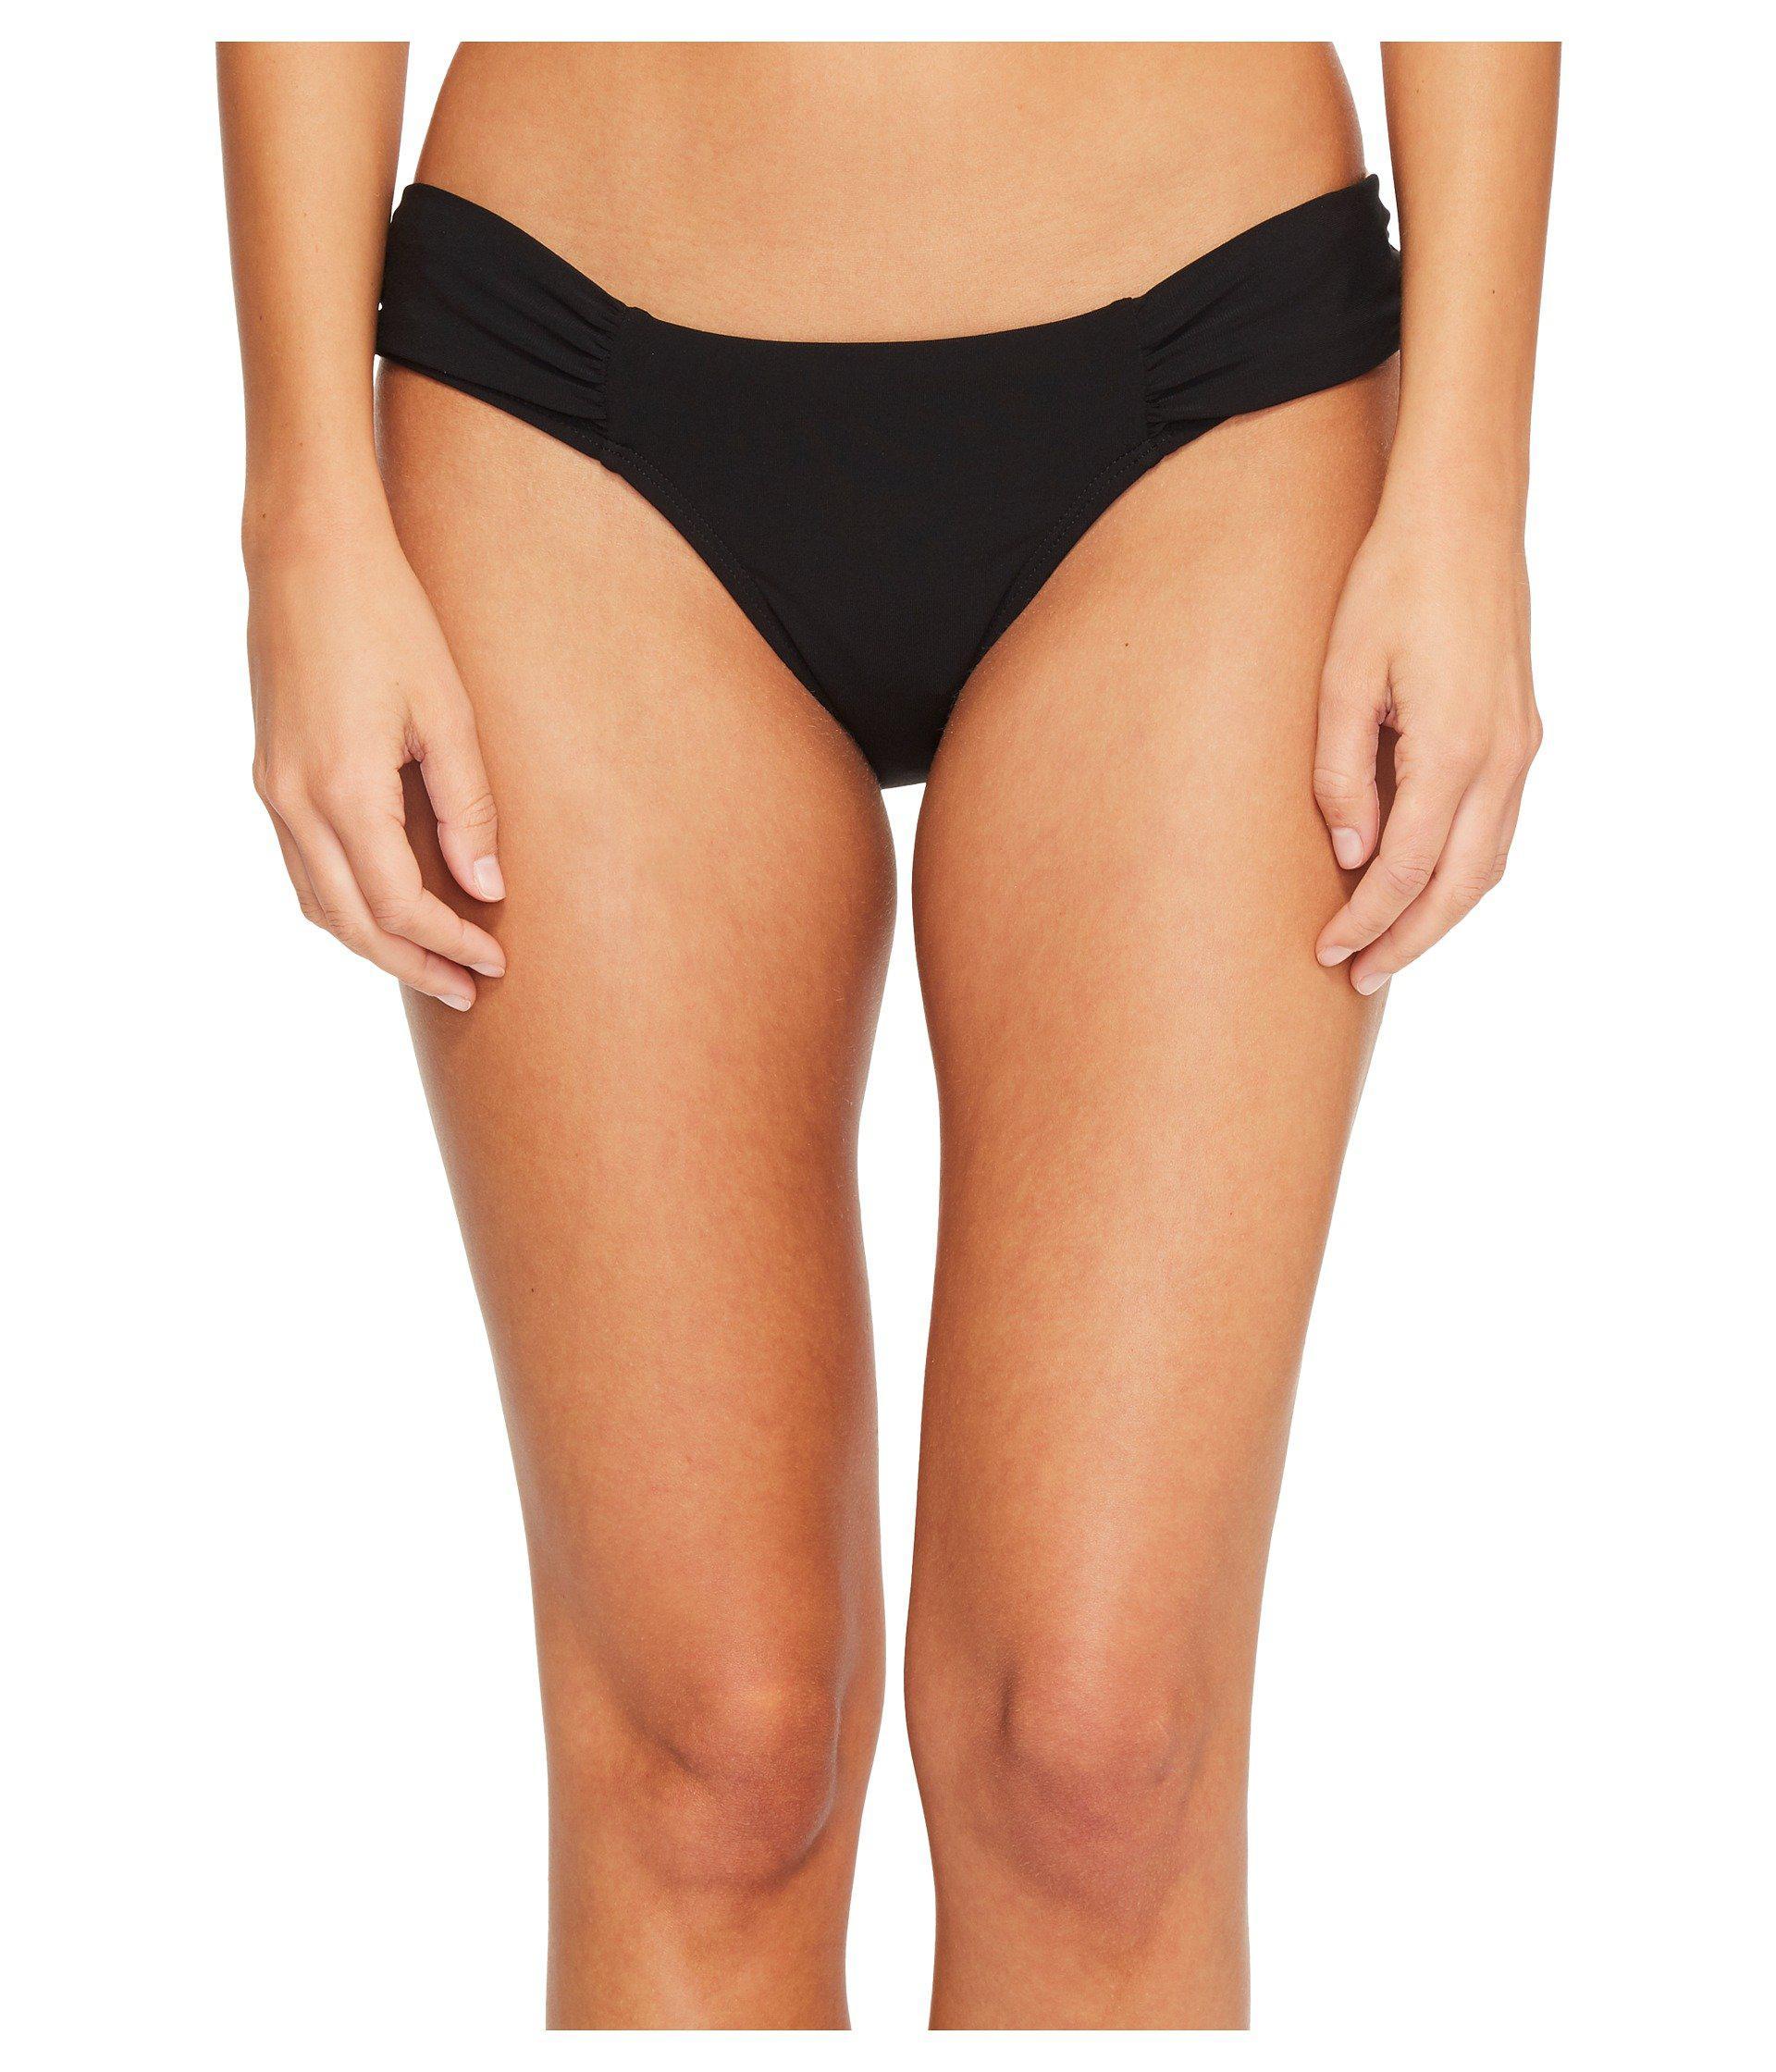 ca2c778a41c77 Lyst - Robin Piccone Ava Tab Side Bikini Bottom in Black - Save 24%